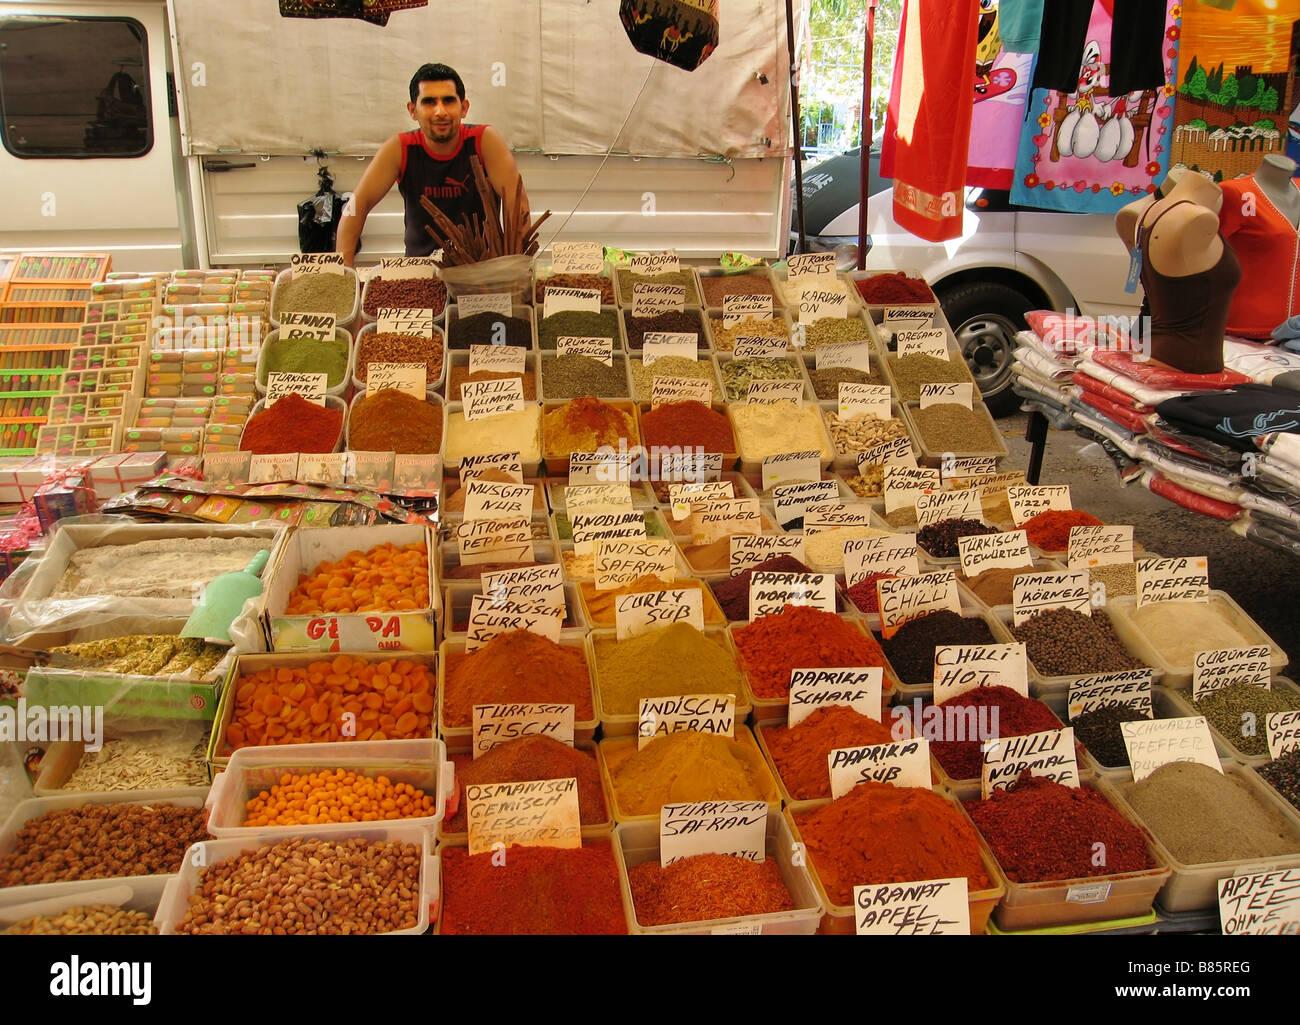 Street bazaar Alanya Turkey - Stock Image